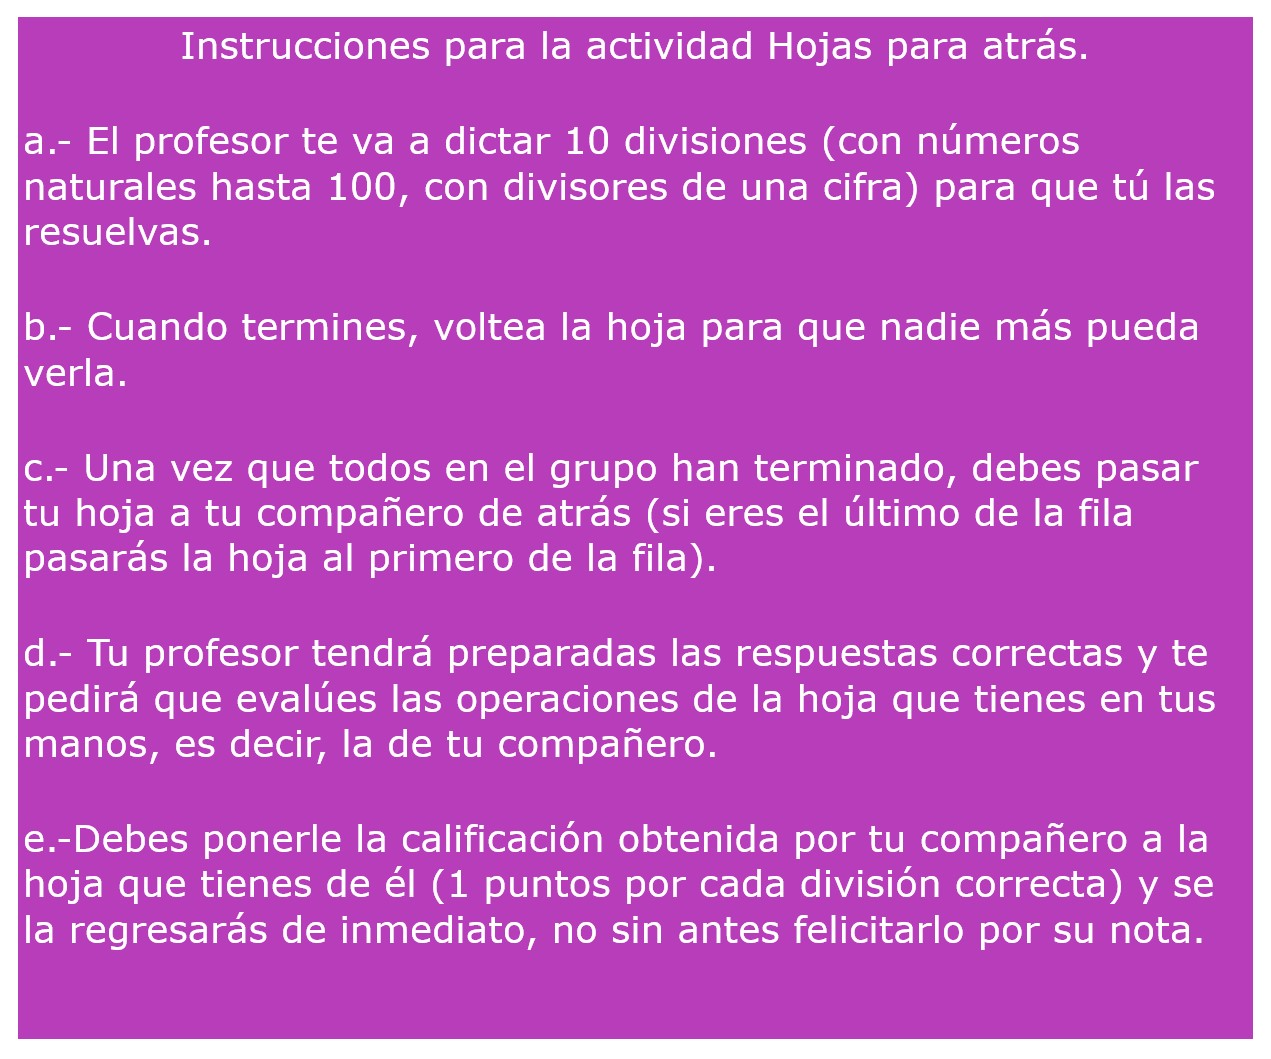 Hojas+para+atr%C3%A1s.jpg